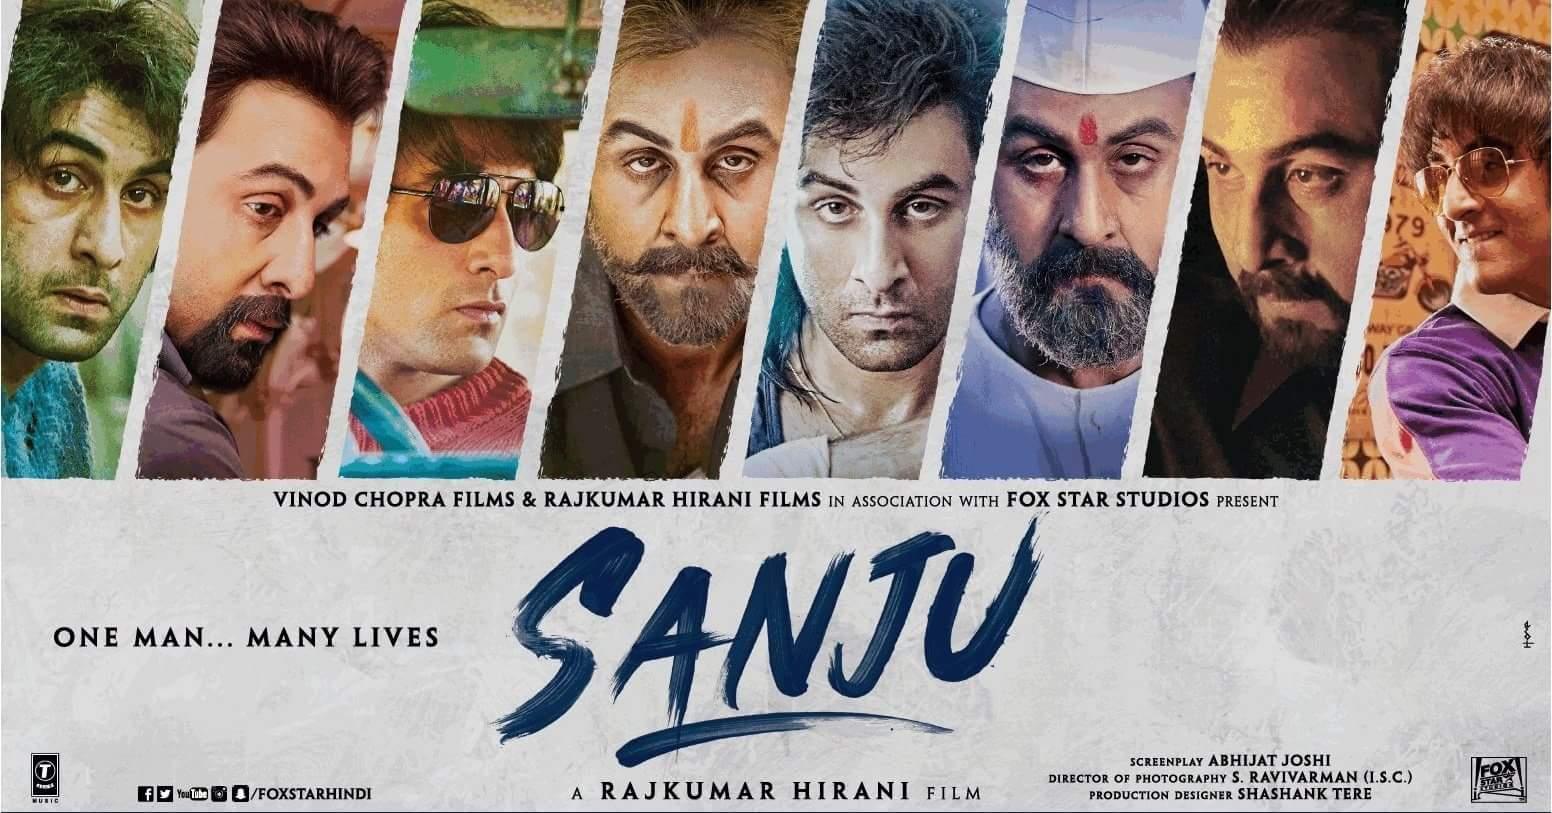 SANJU (2018) con RANBIR KAPOOR + Jukebox + Sub. Español + Online Sanju%2Btv%2Bpremier